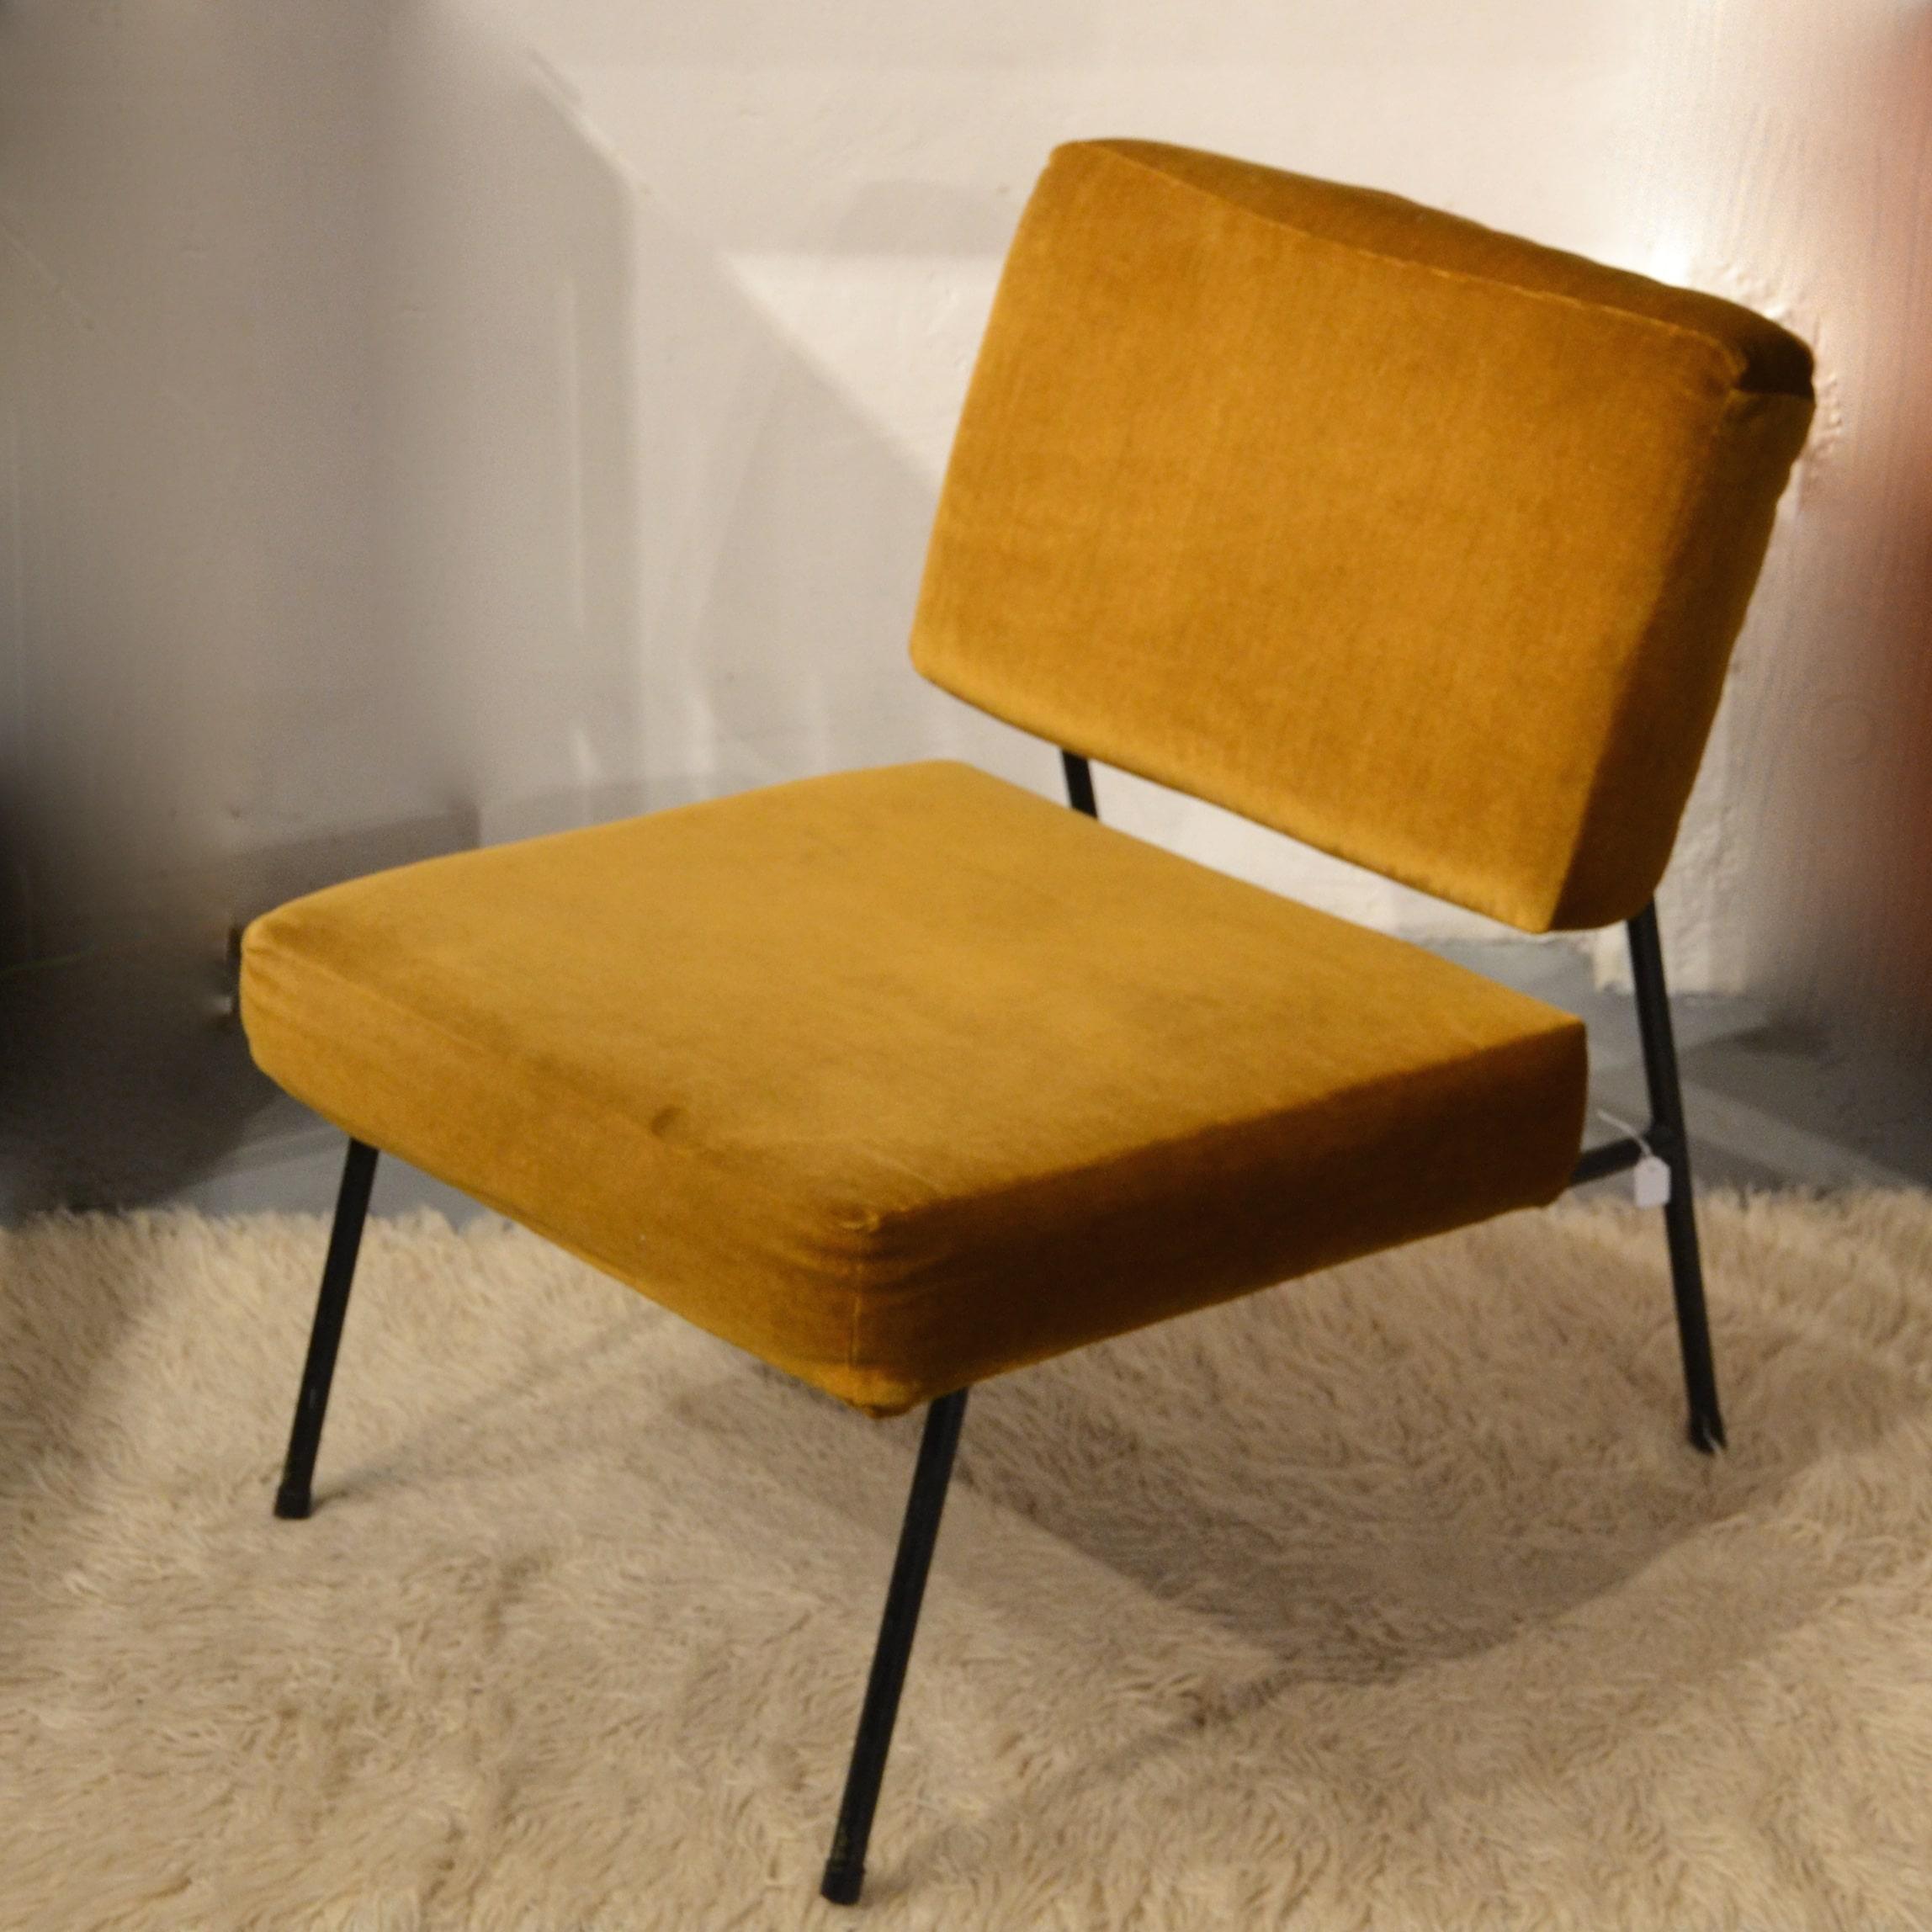 chauffeuse pierre guariche pour airborne bindiesbindies. Black Bedroom Furniture Sets. Home Design Ideas